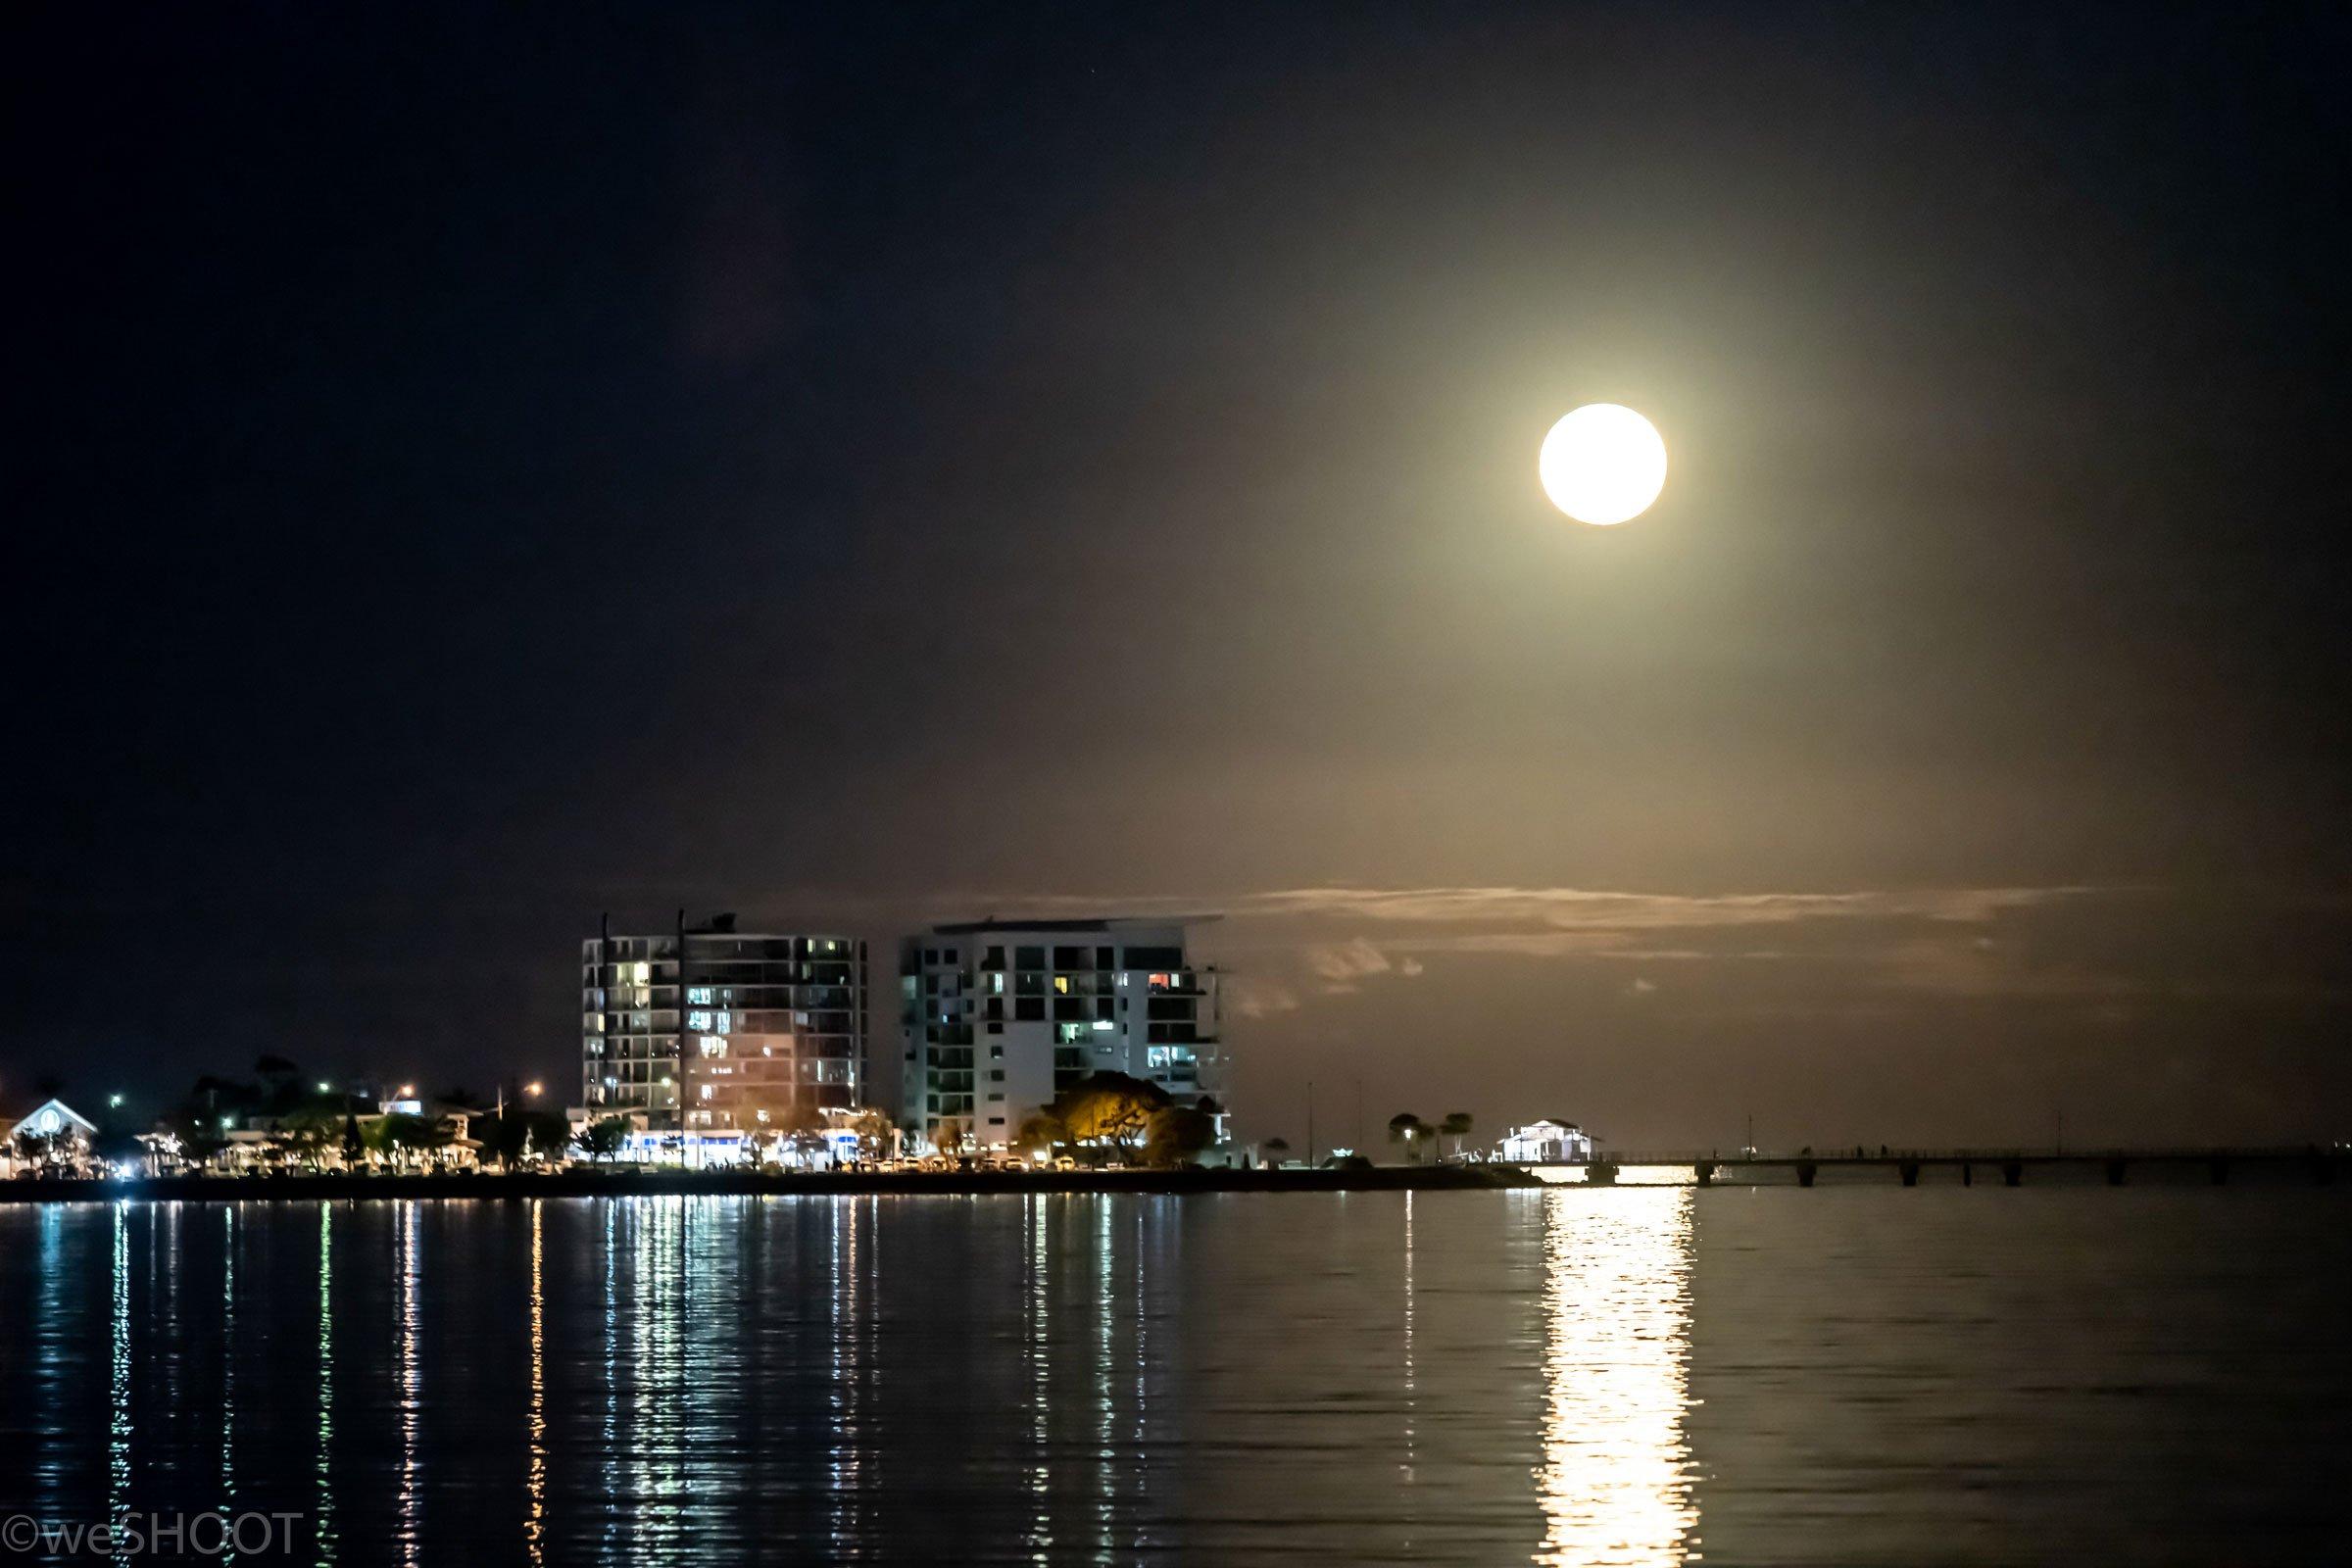 Nightlife Photography